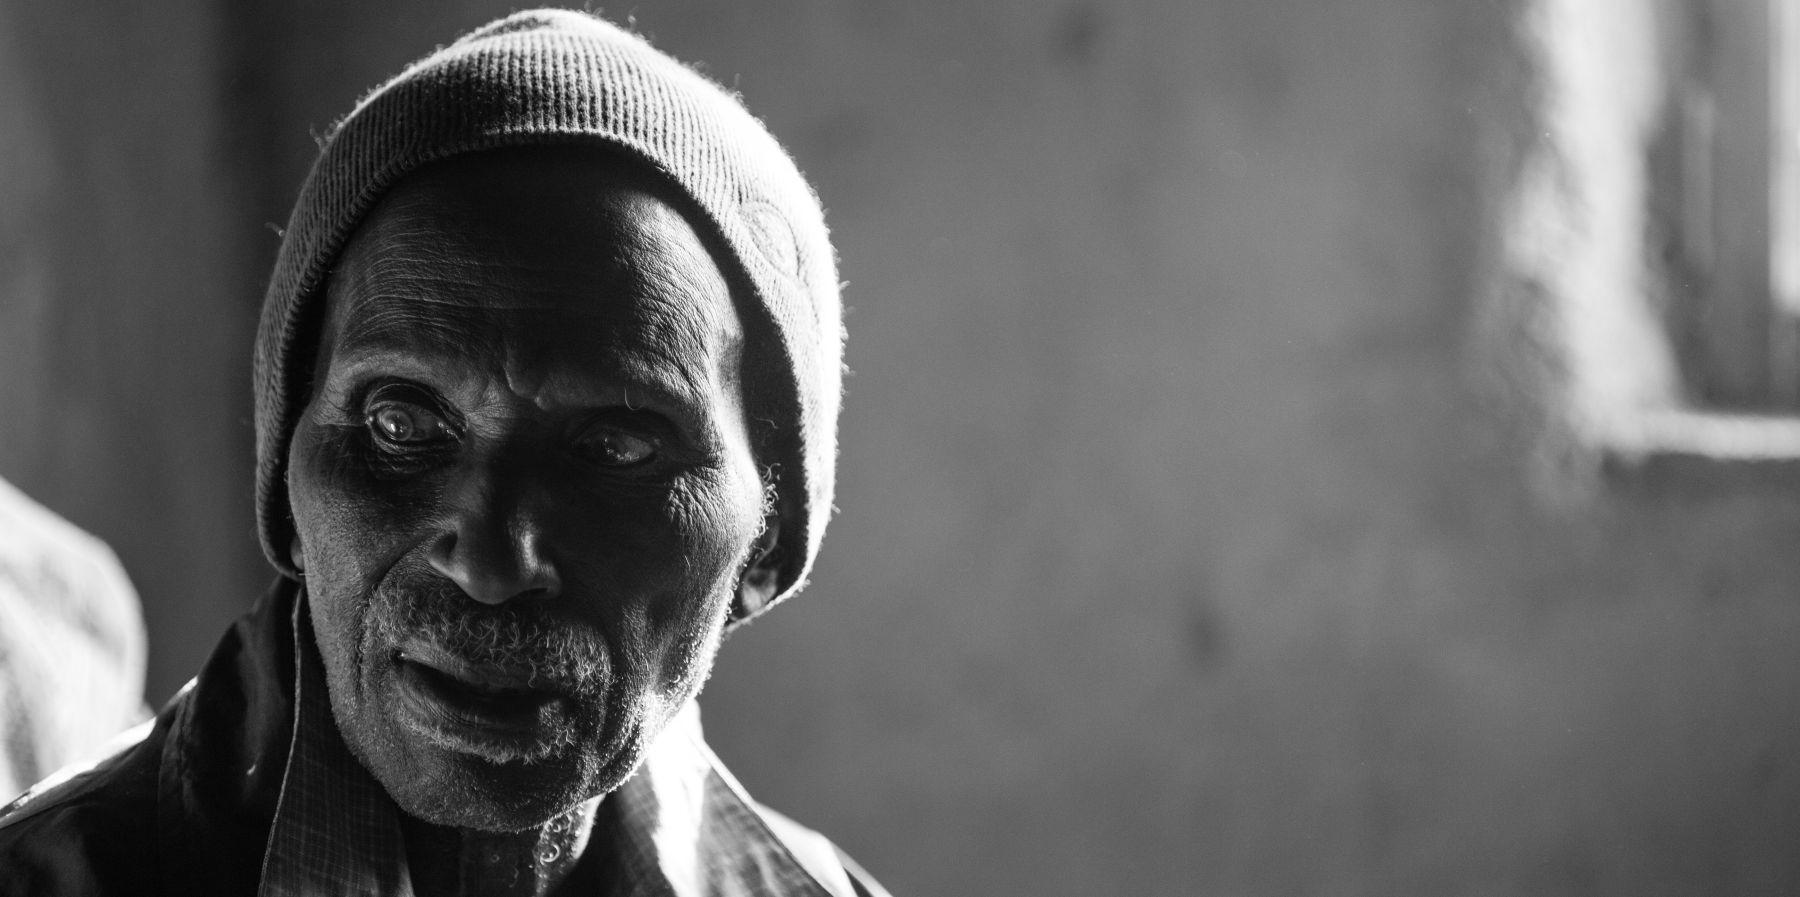 Afrika Portrait.jpg